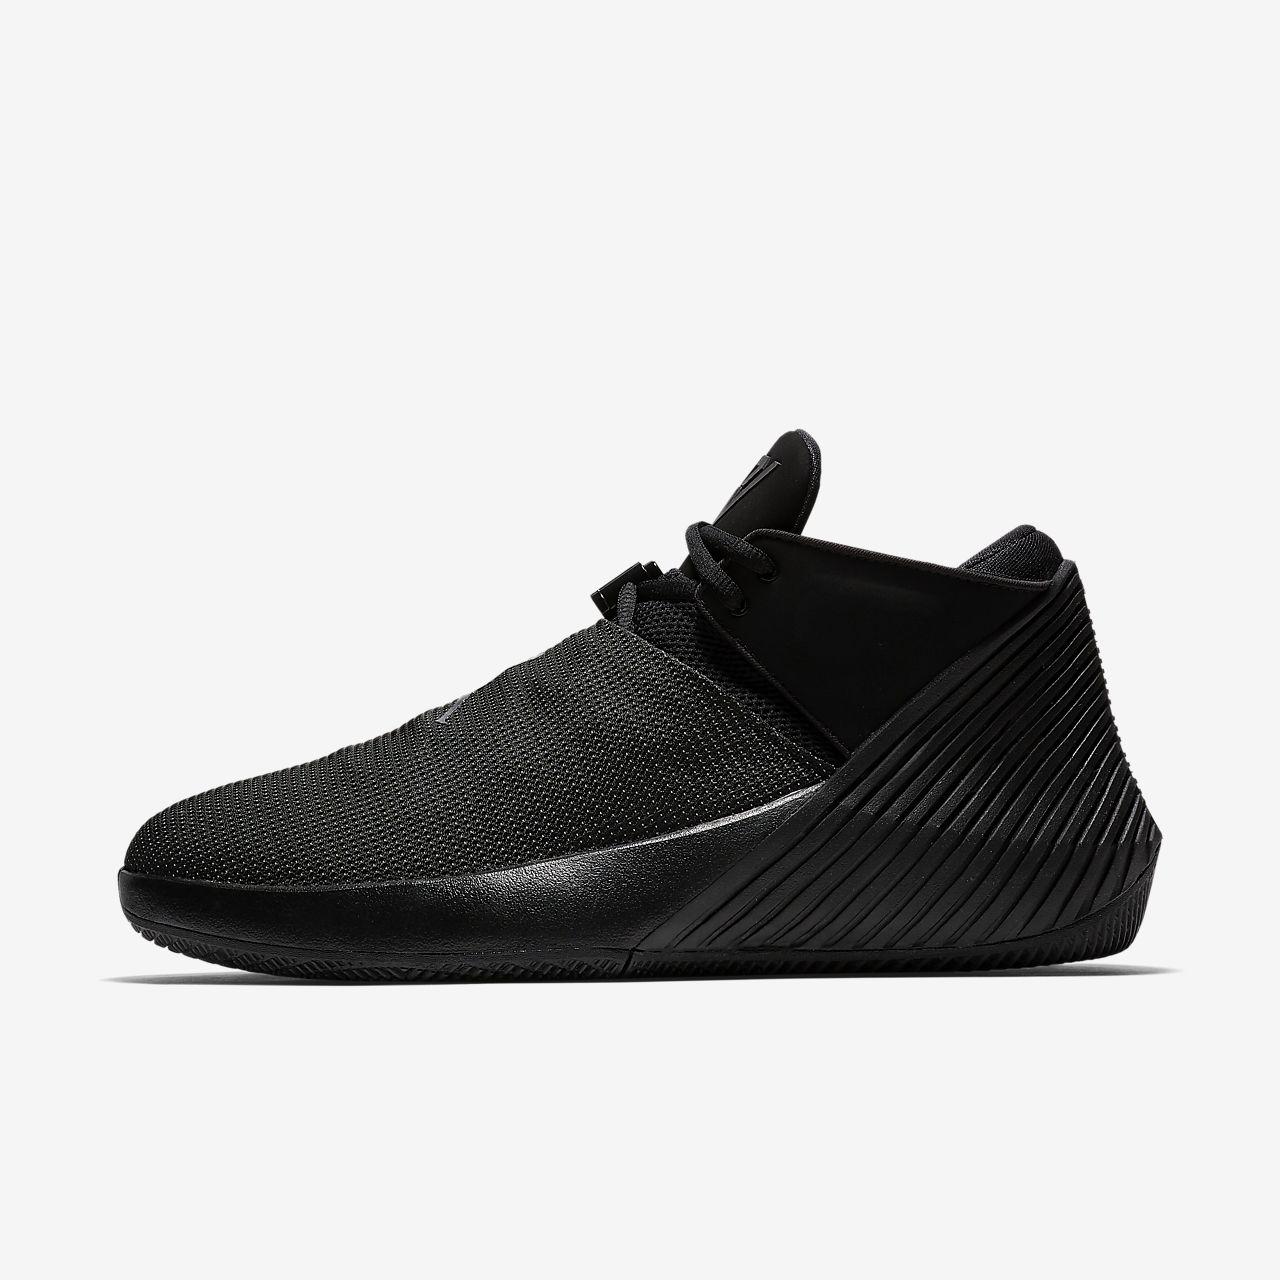 Jordan Why Not Zer0.1 Low PFX 男子篮球鞋